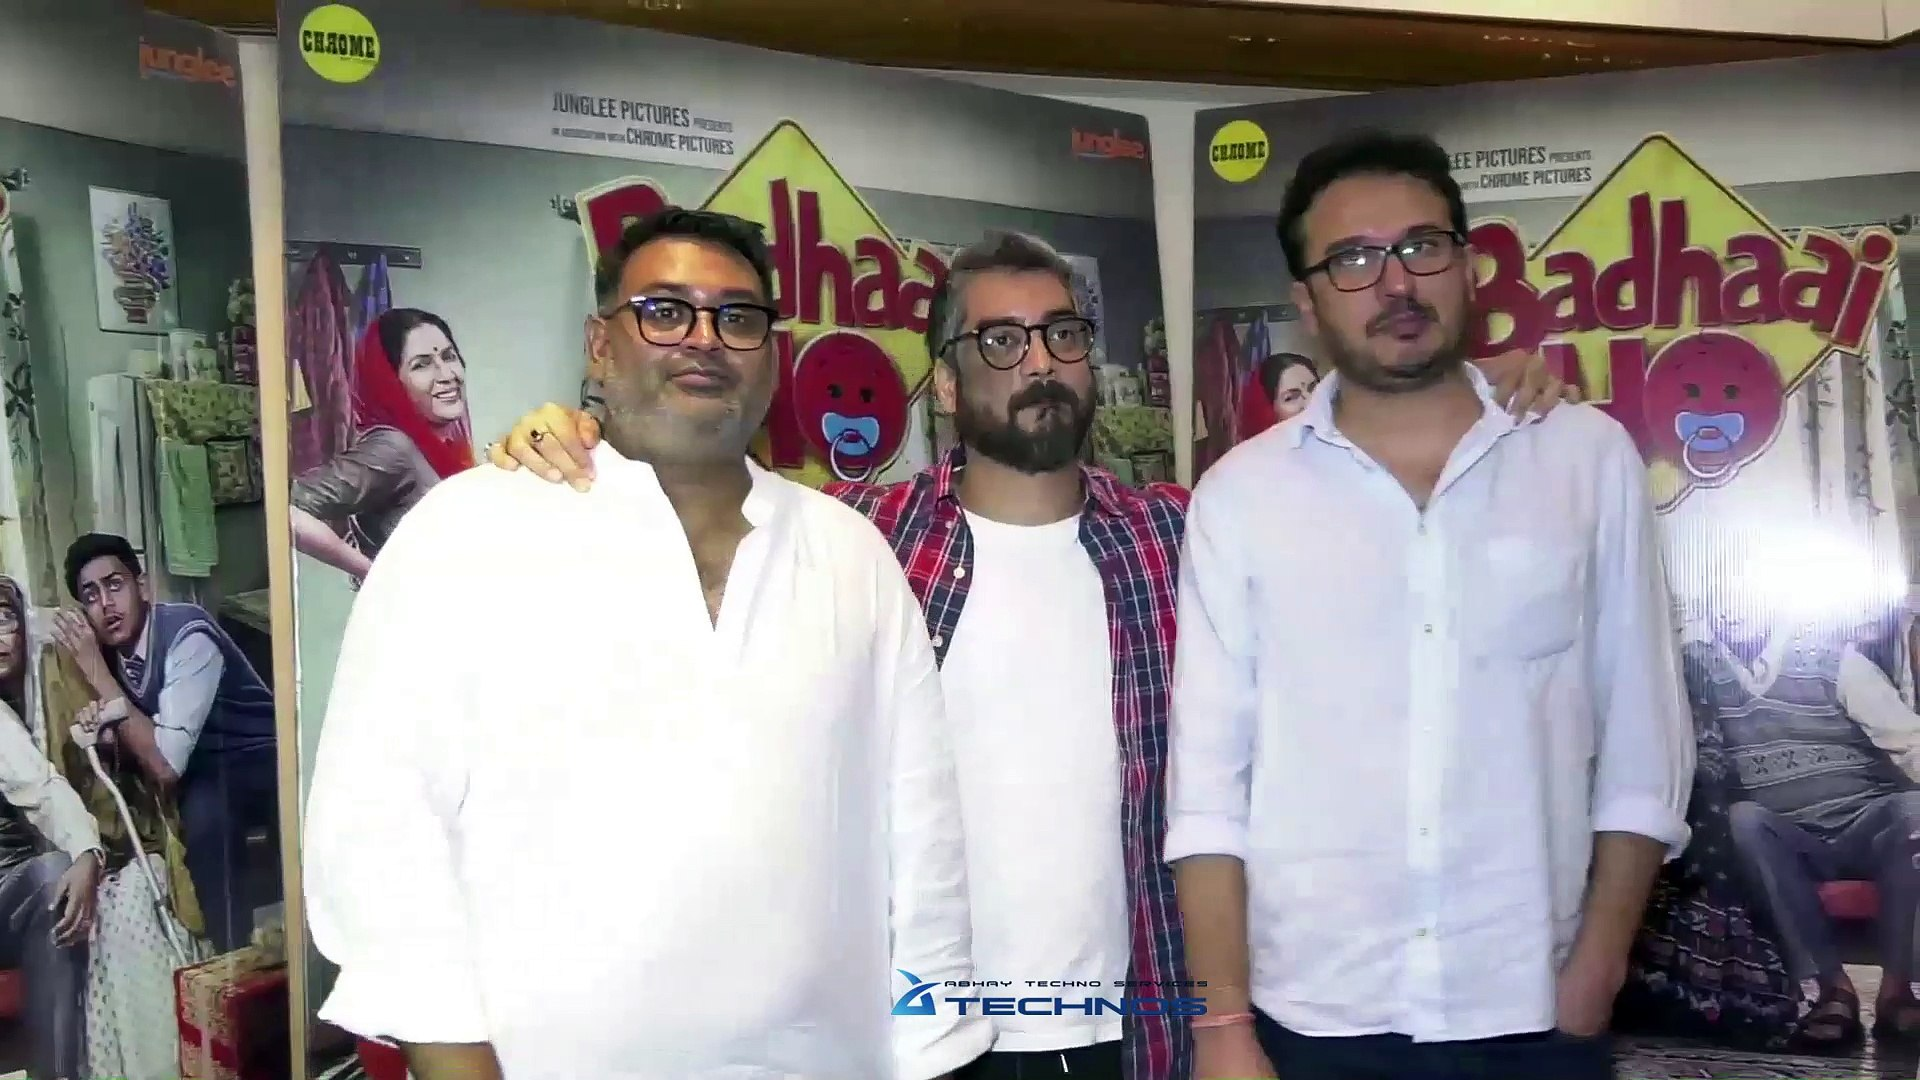 UNCUT - Badhaai Ho Success Group Interview   Amit Sharma, Shantanu Srivastava, Akshat Ghildial